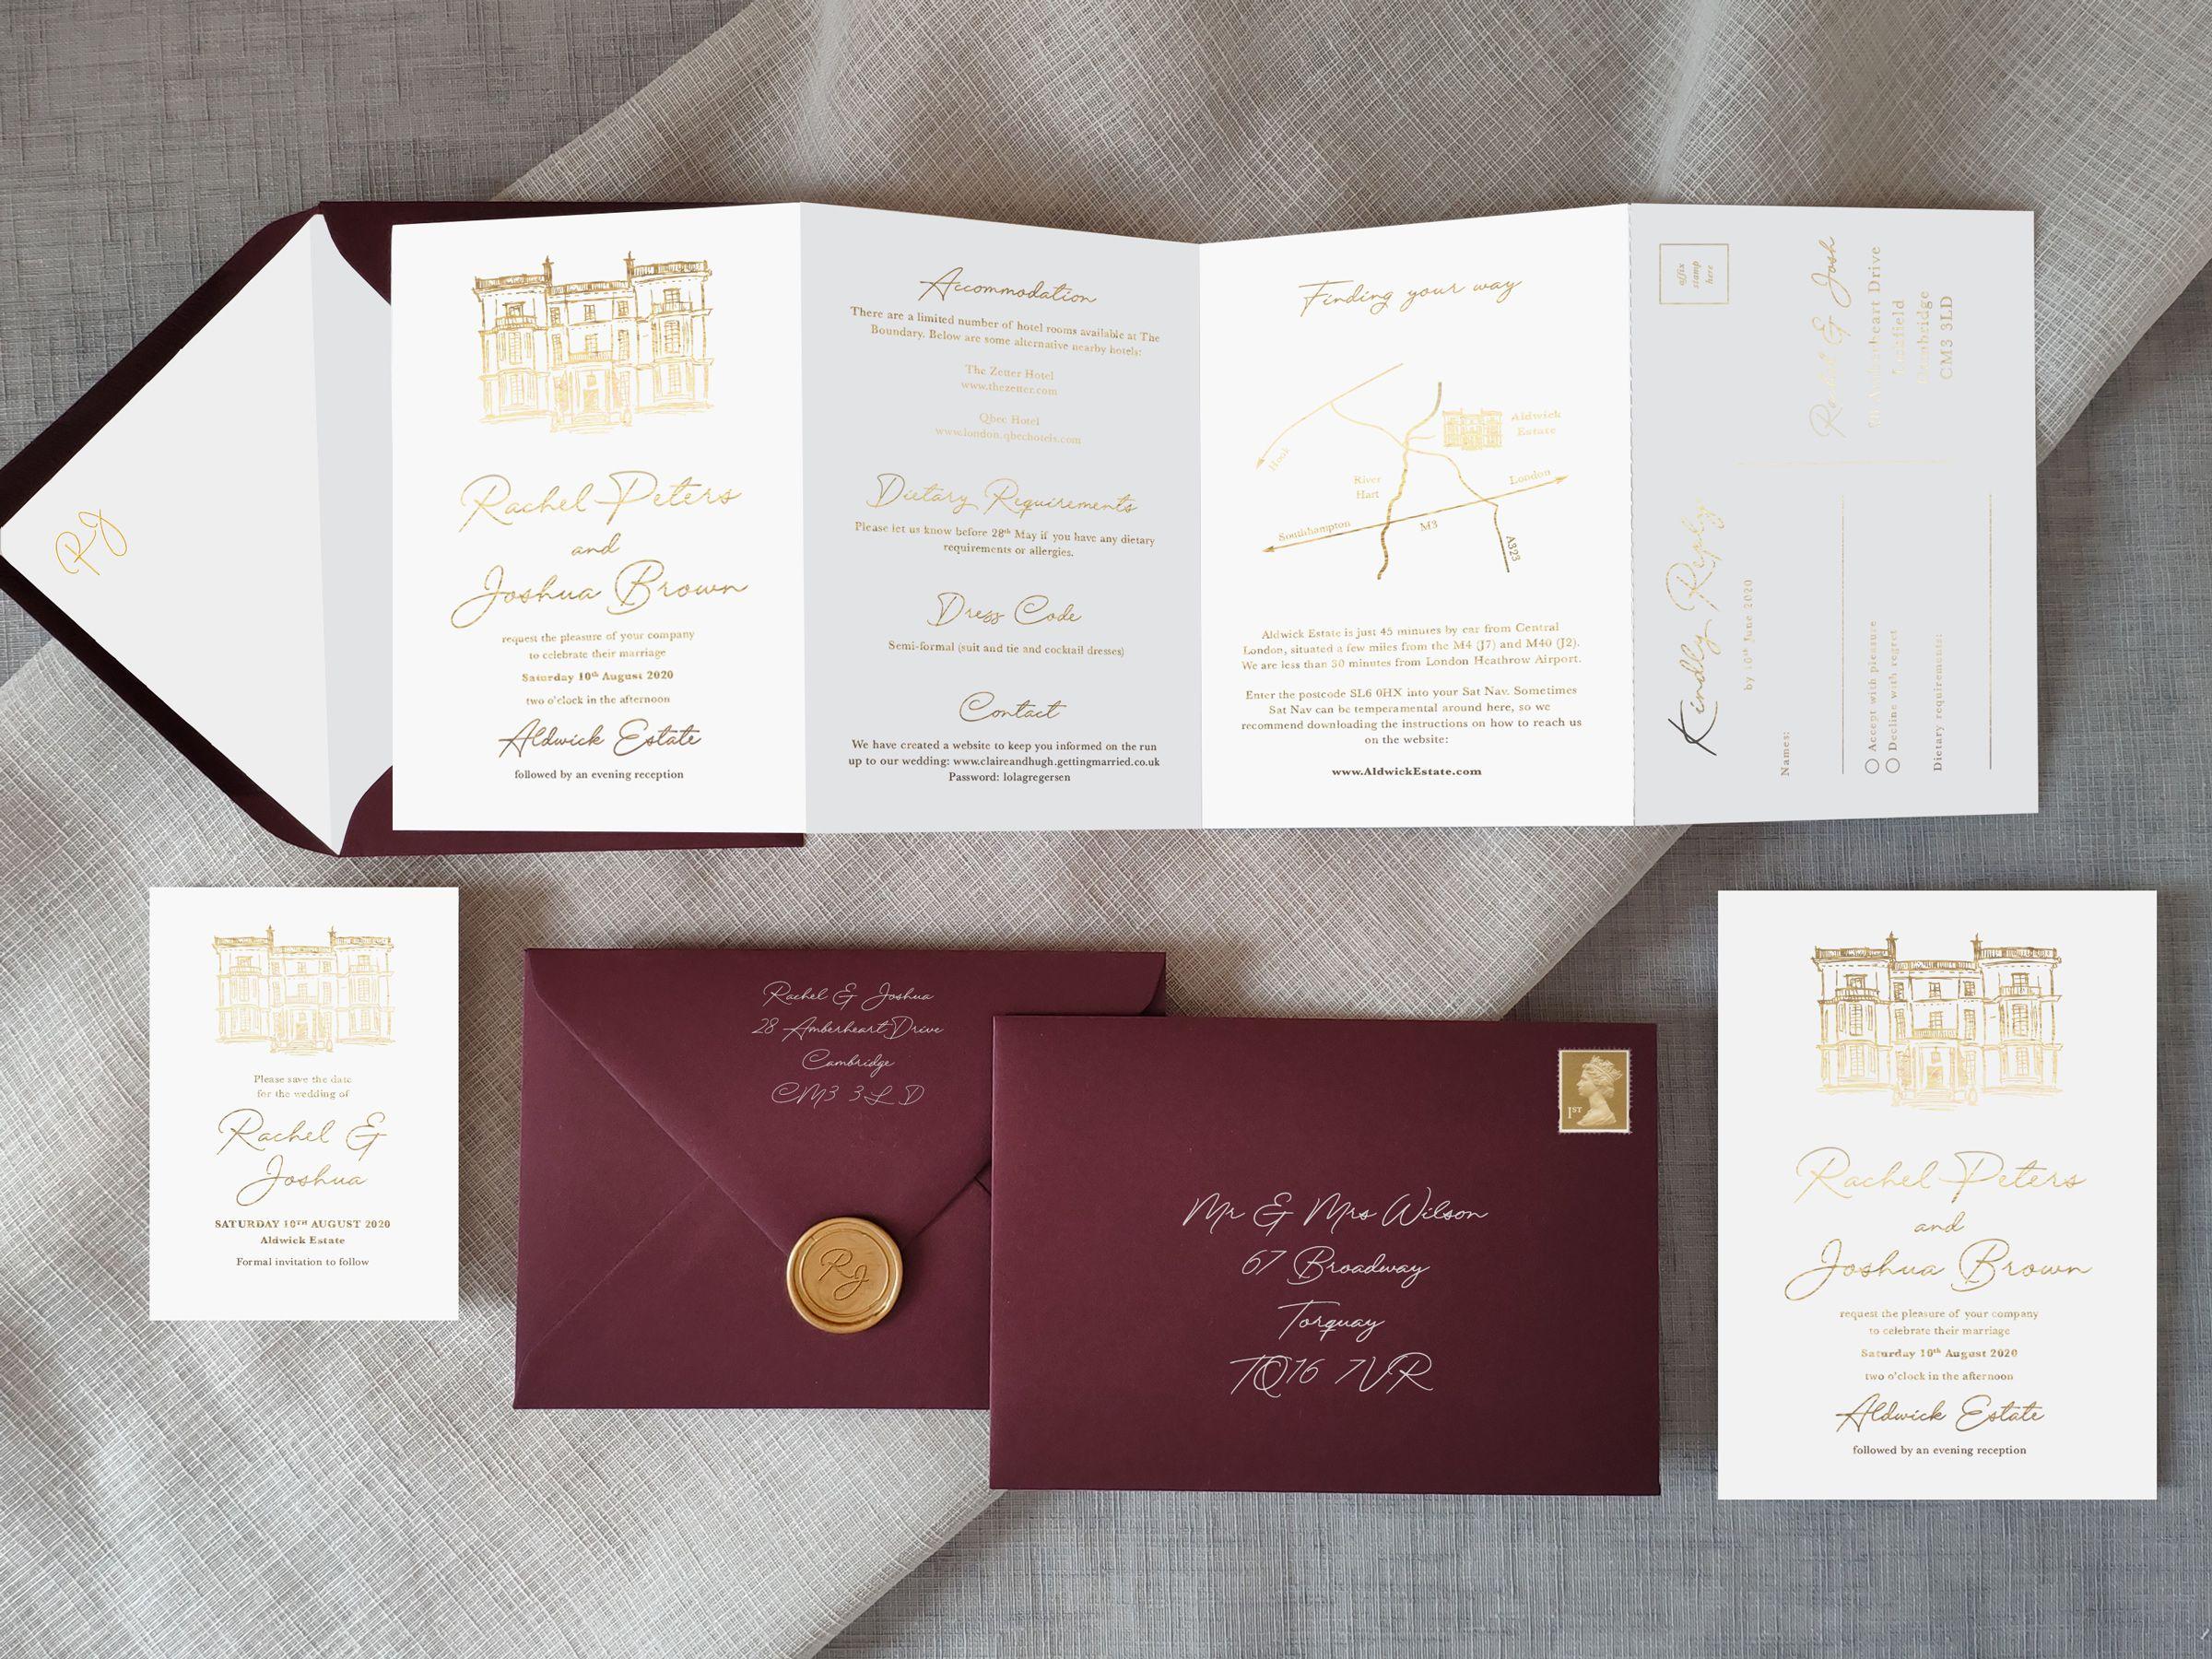 Foiled Venue Wedding Invitations Fun wedding invitations